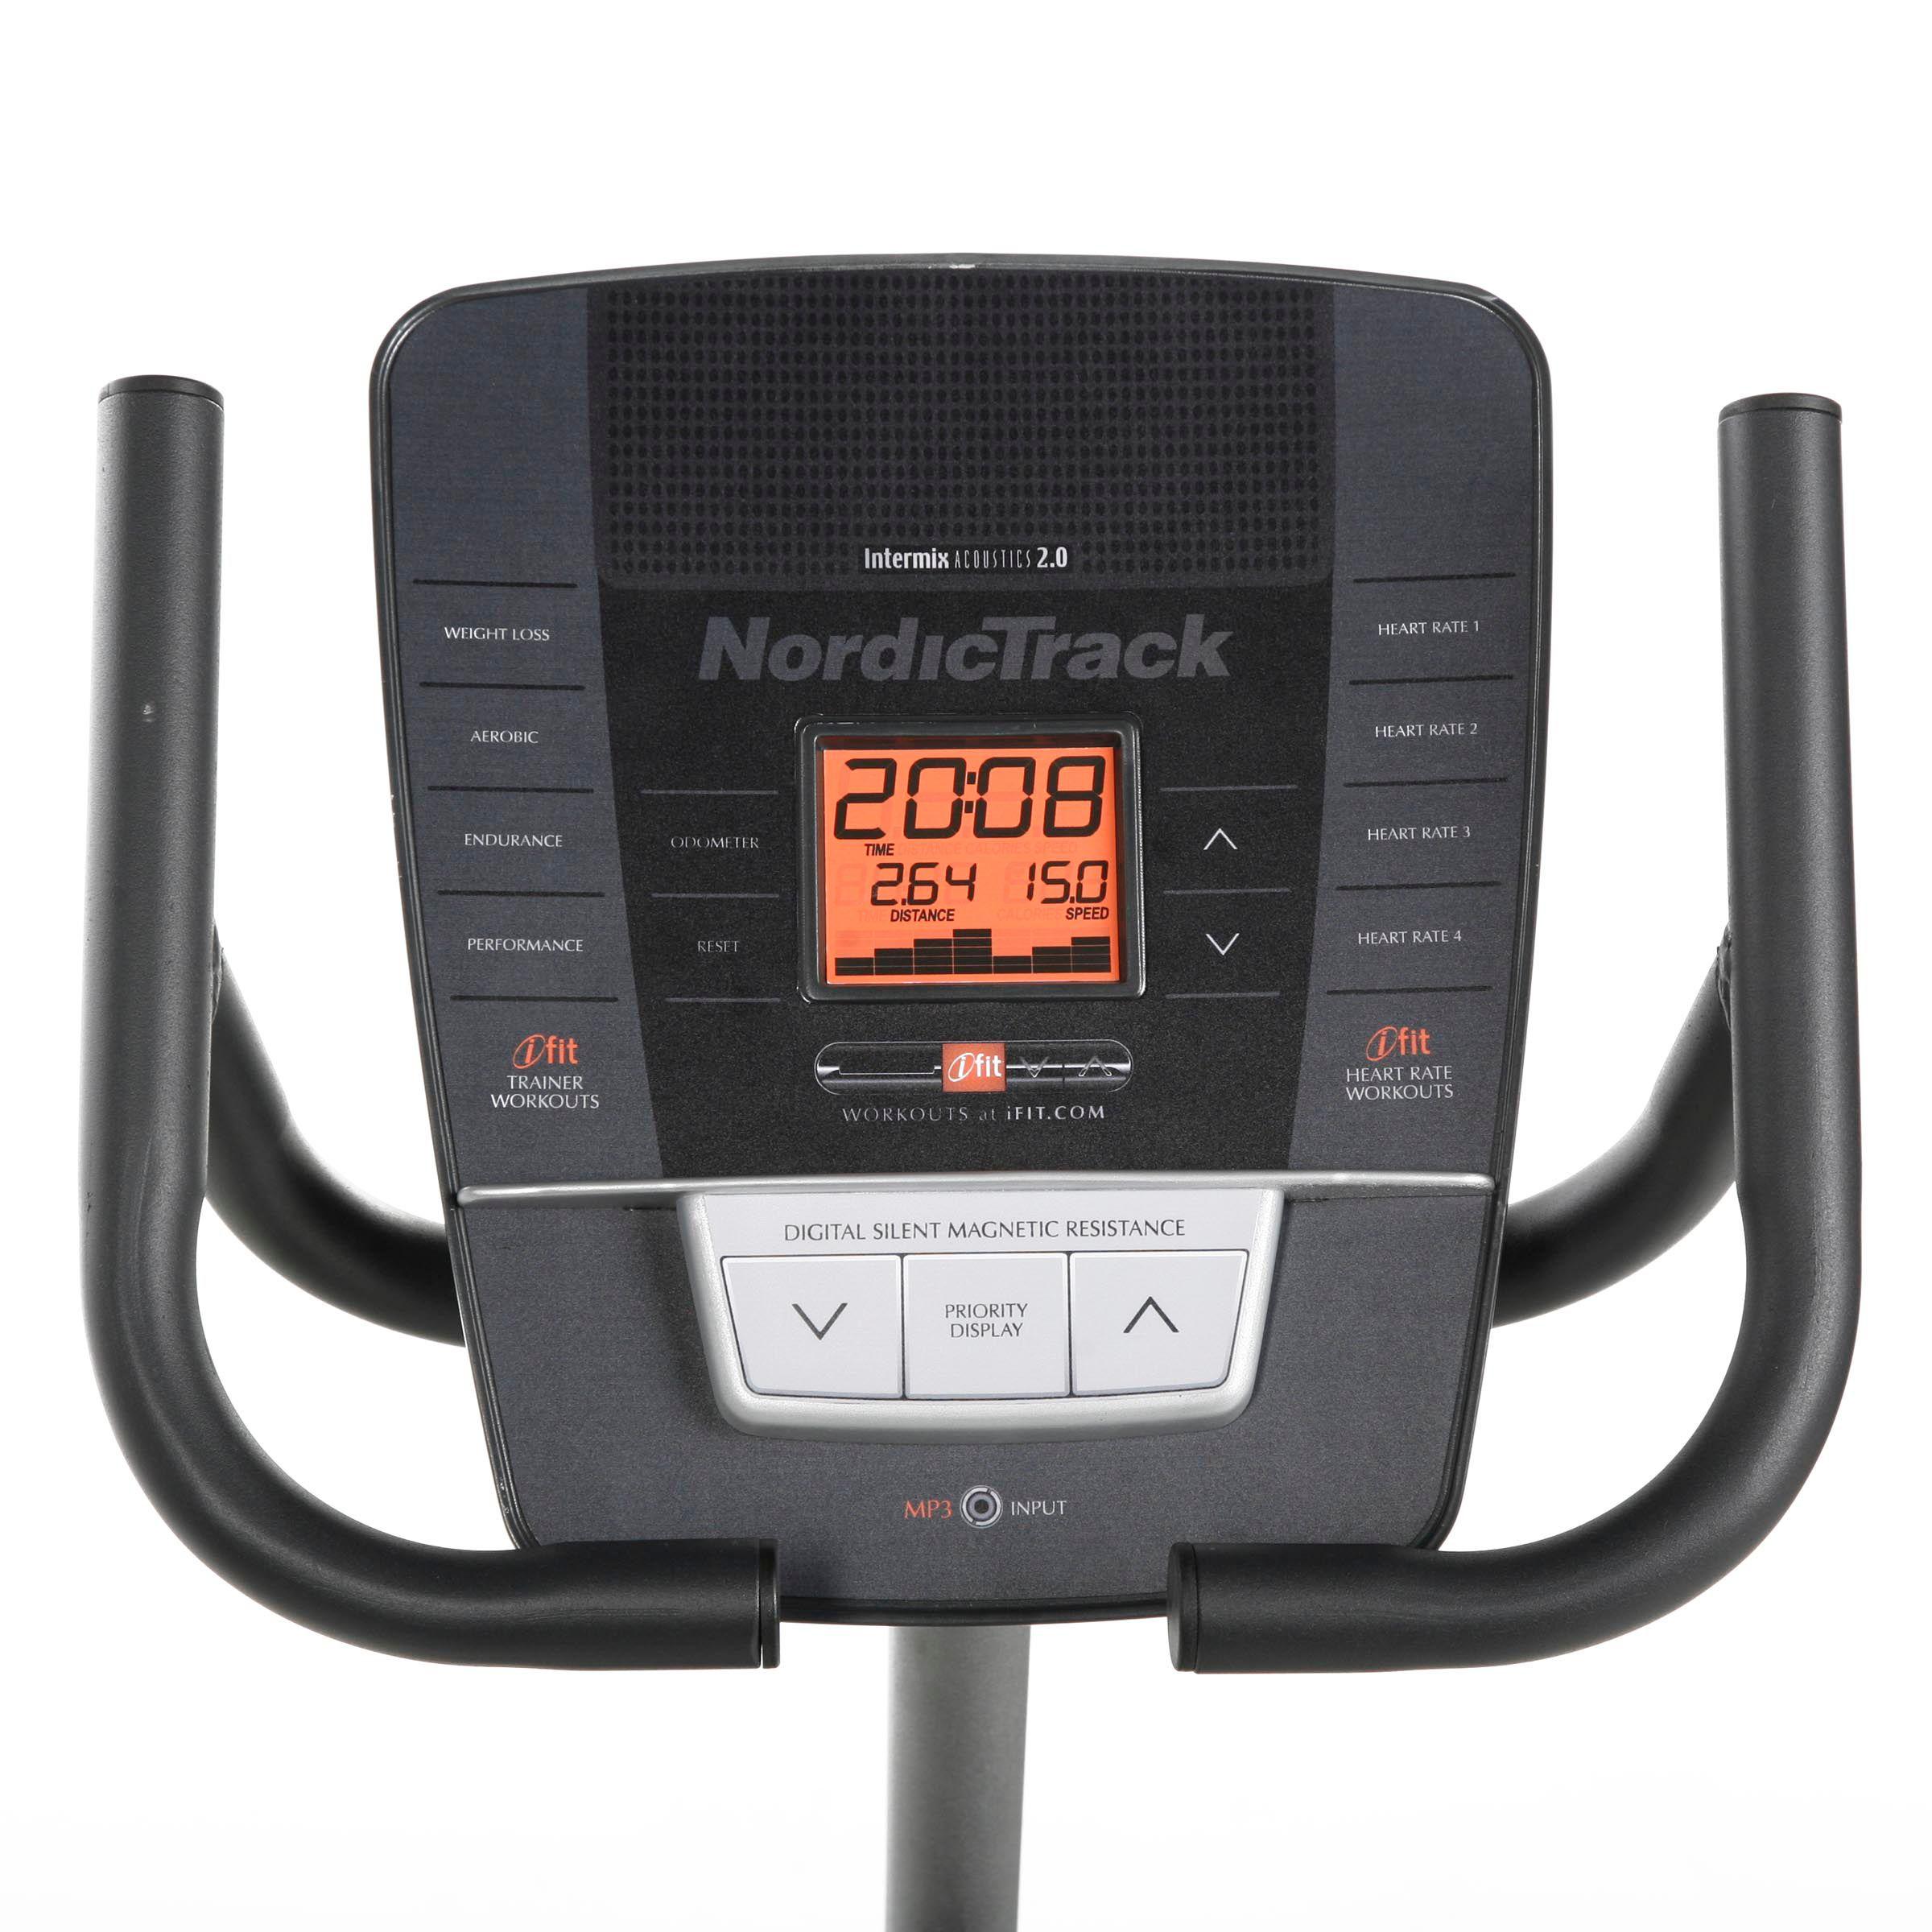 NordicTrack C3 si Recumbent Exercise Bike